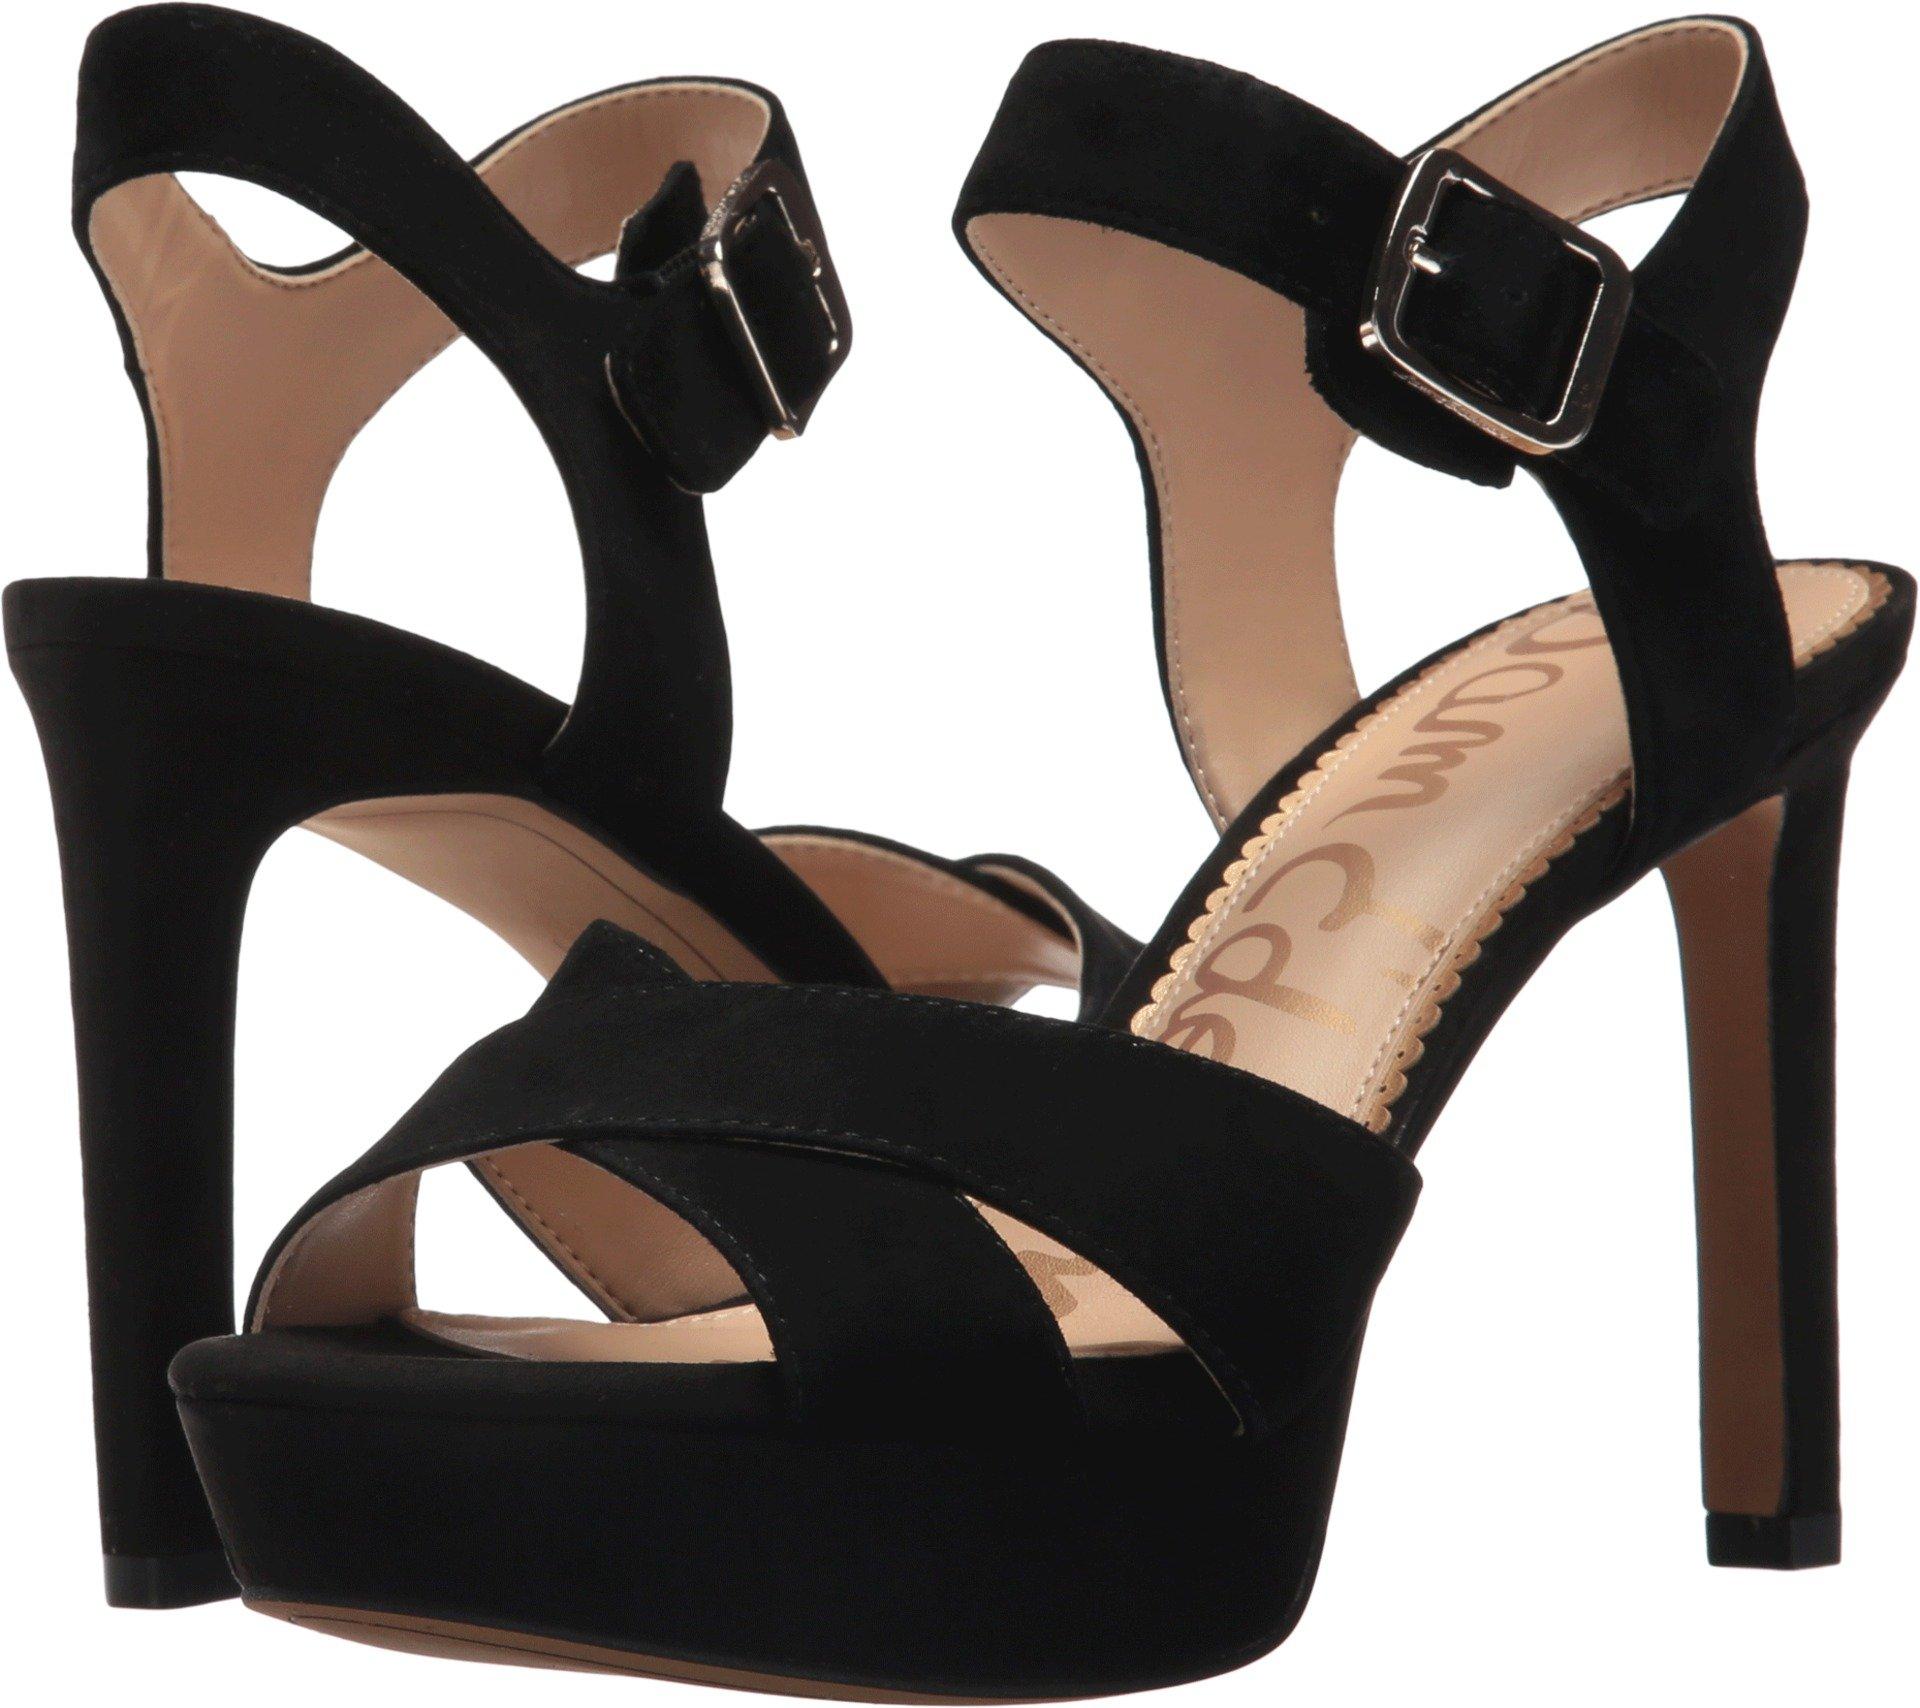 Sam Edelman Women's Jordan Heeled Sandal, Black Suede, 6.5 Medium US